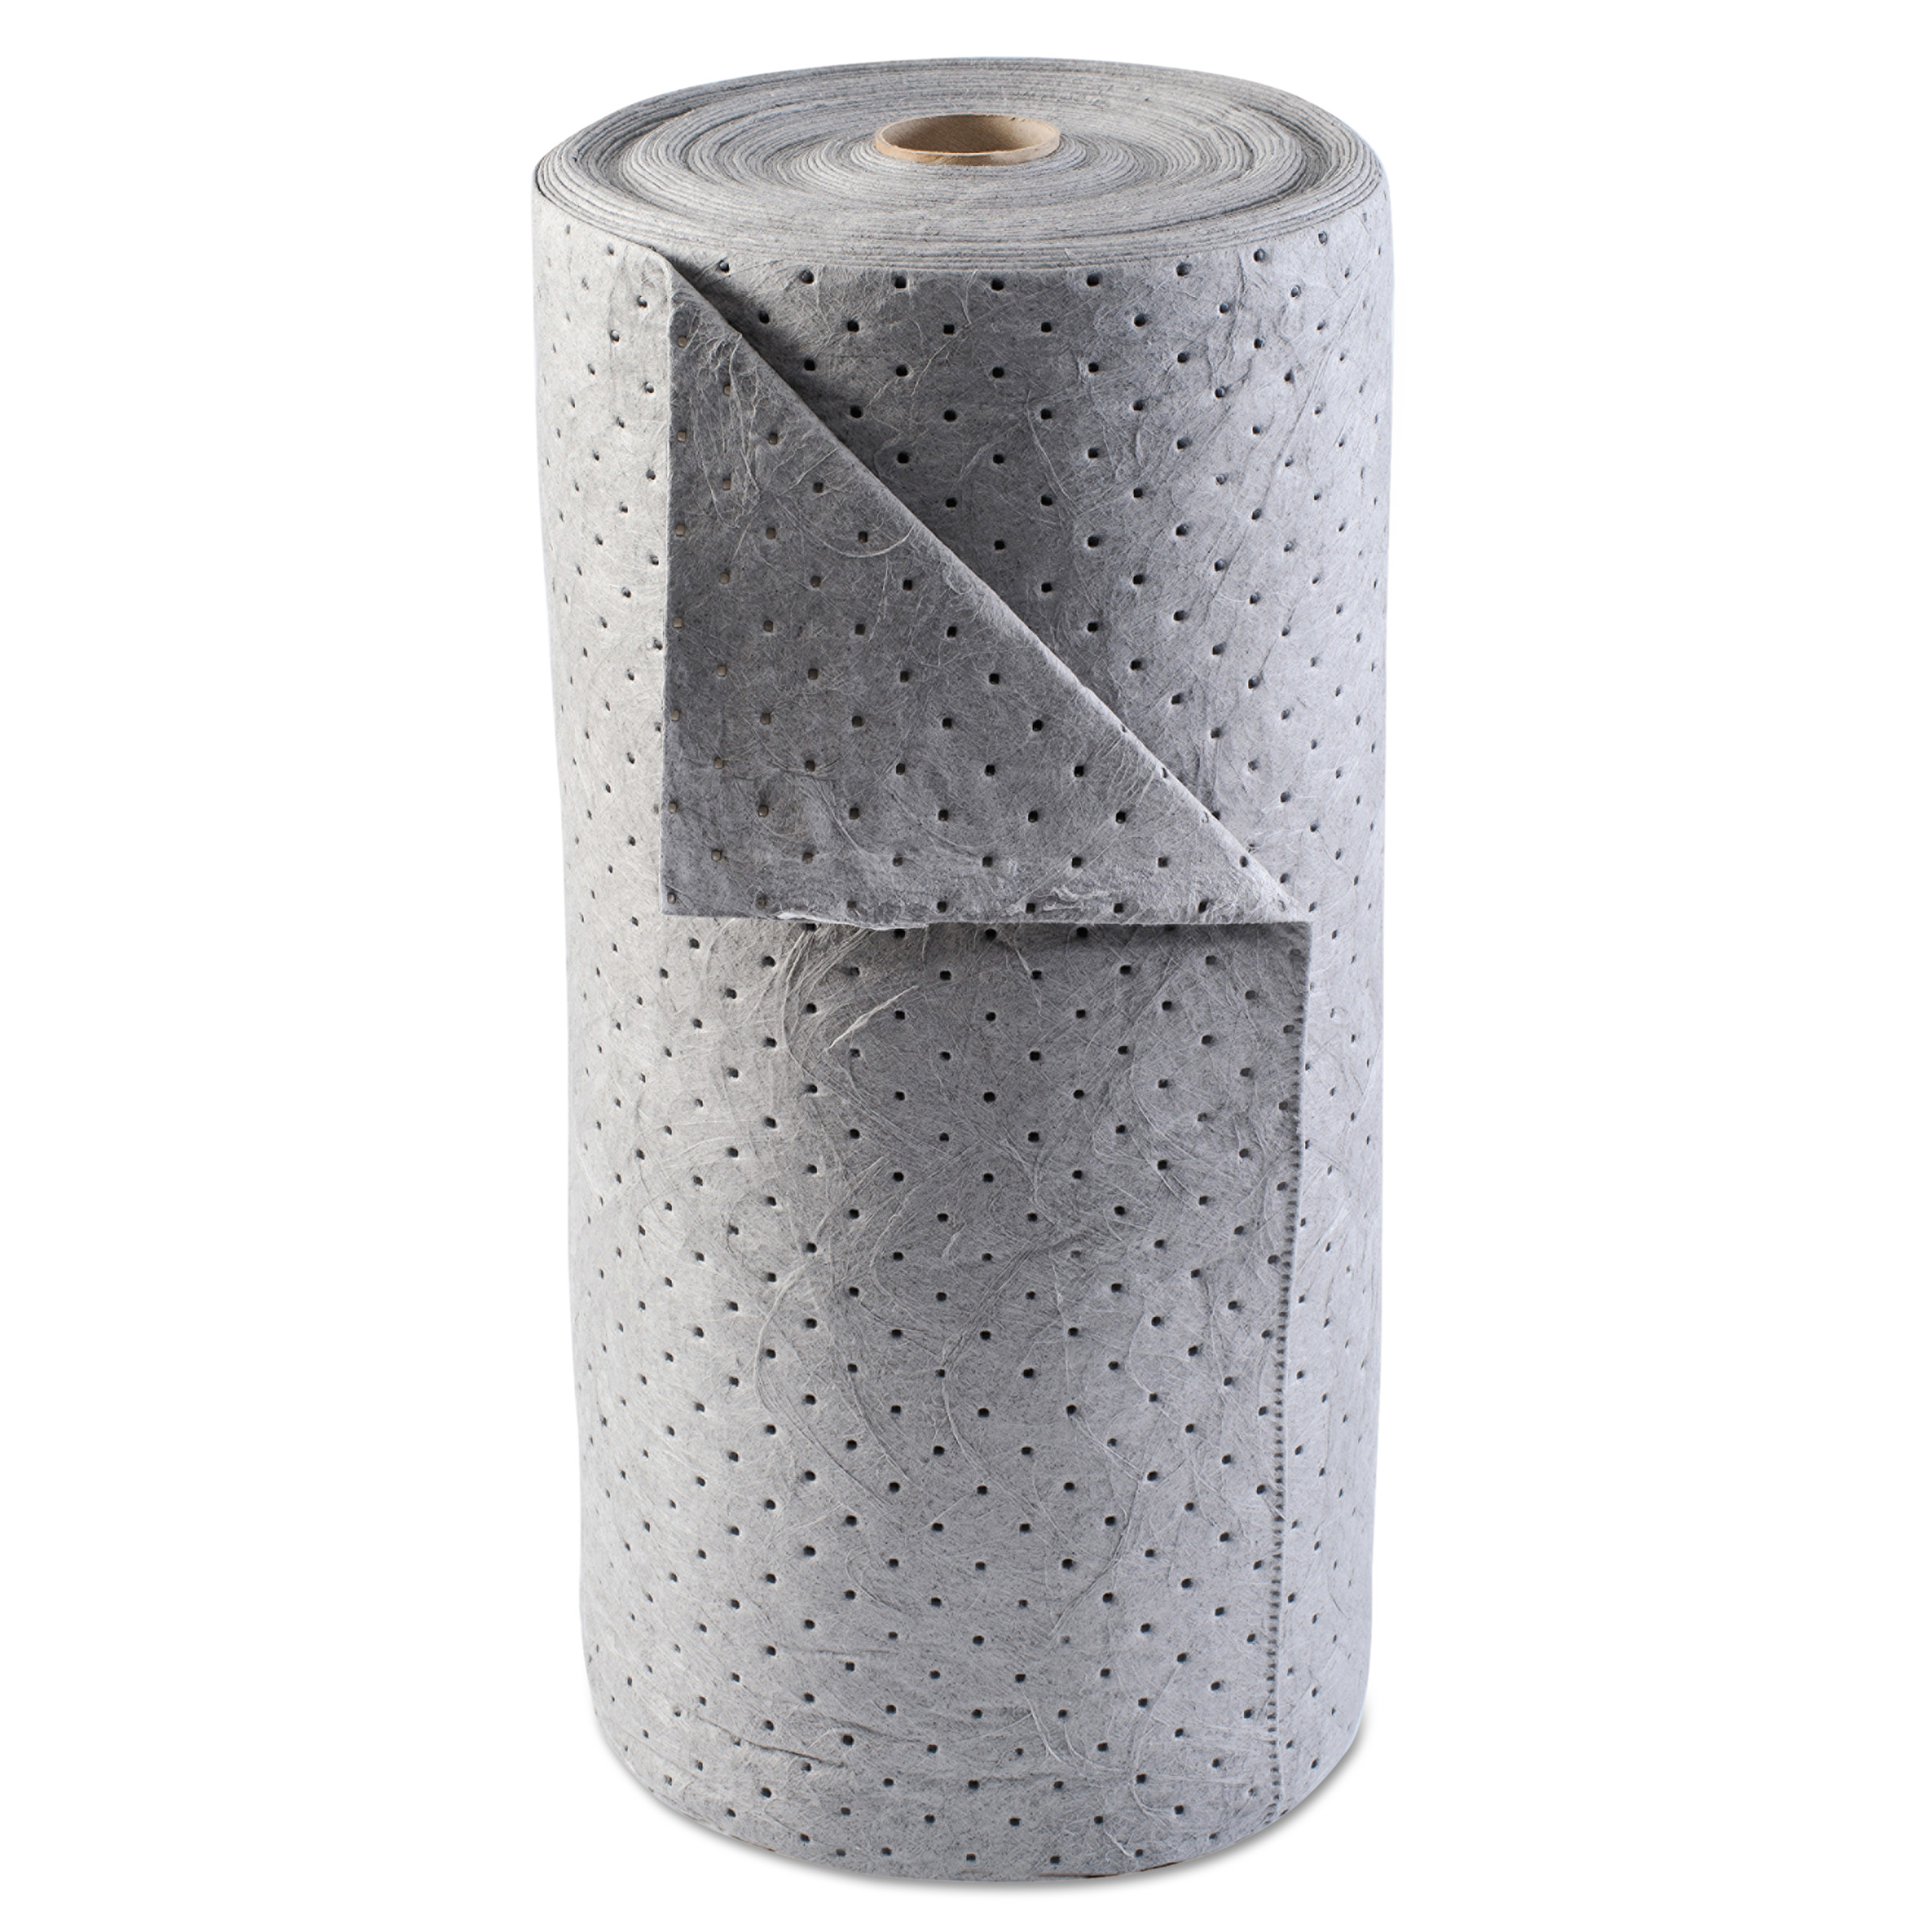 Anchor Brand Universal Sorbent-Pad Roll, 30w x 120ft, Gray